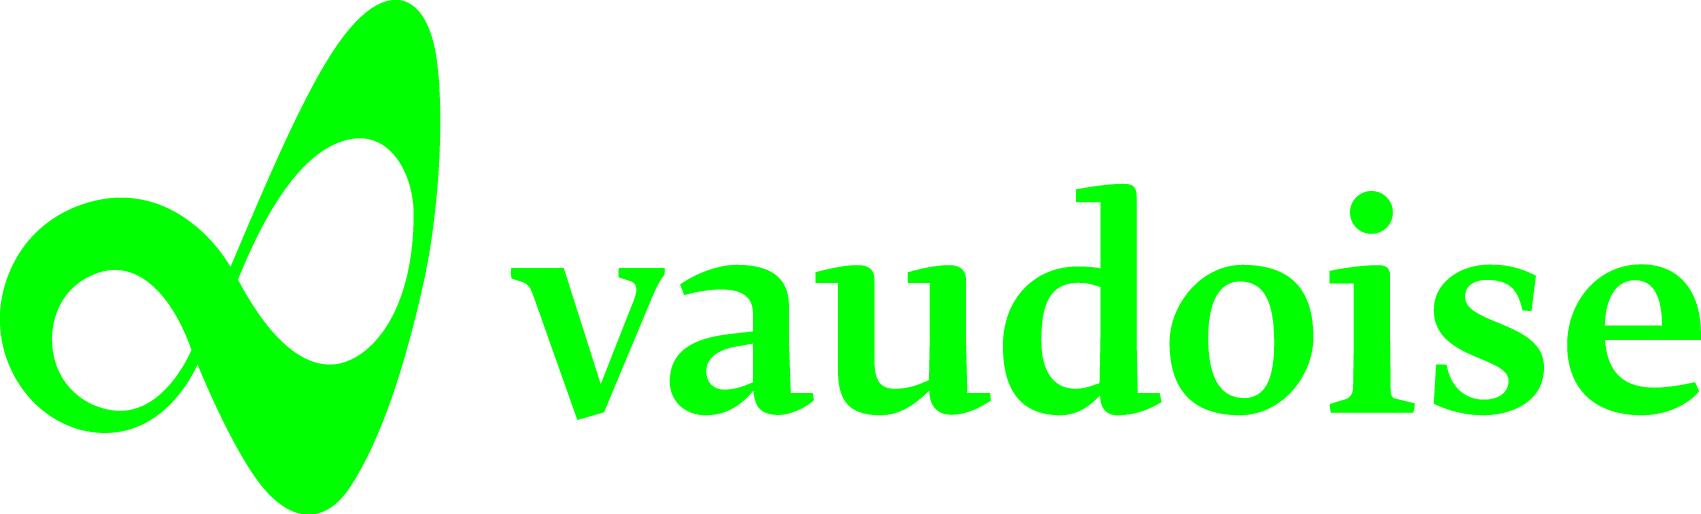 https://www.kiwanis-vevey-montreux.ch/wp-content/uploads/2020/04/vaudoise_logo_4c_23.04.13.jpg